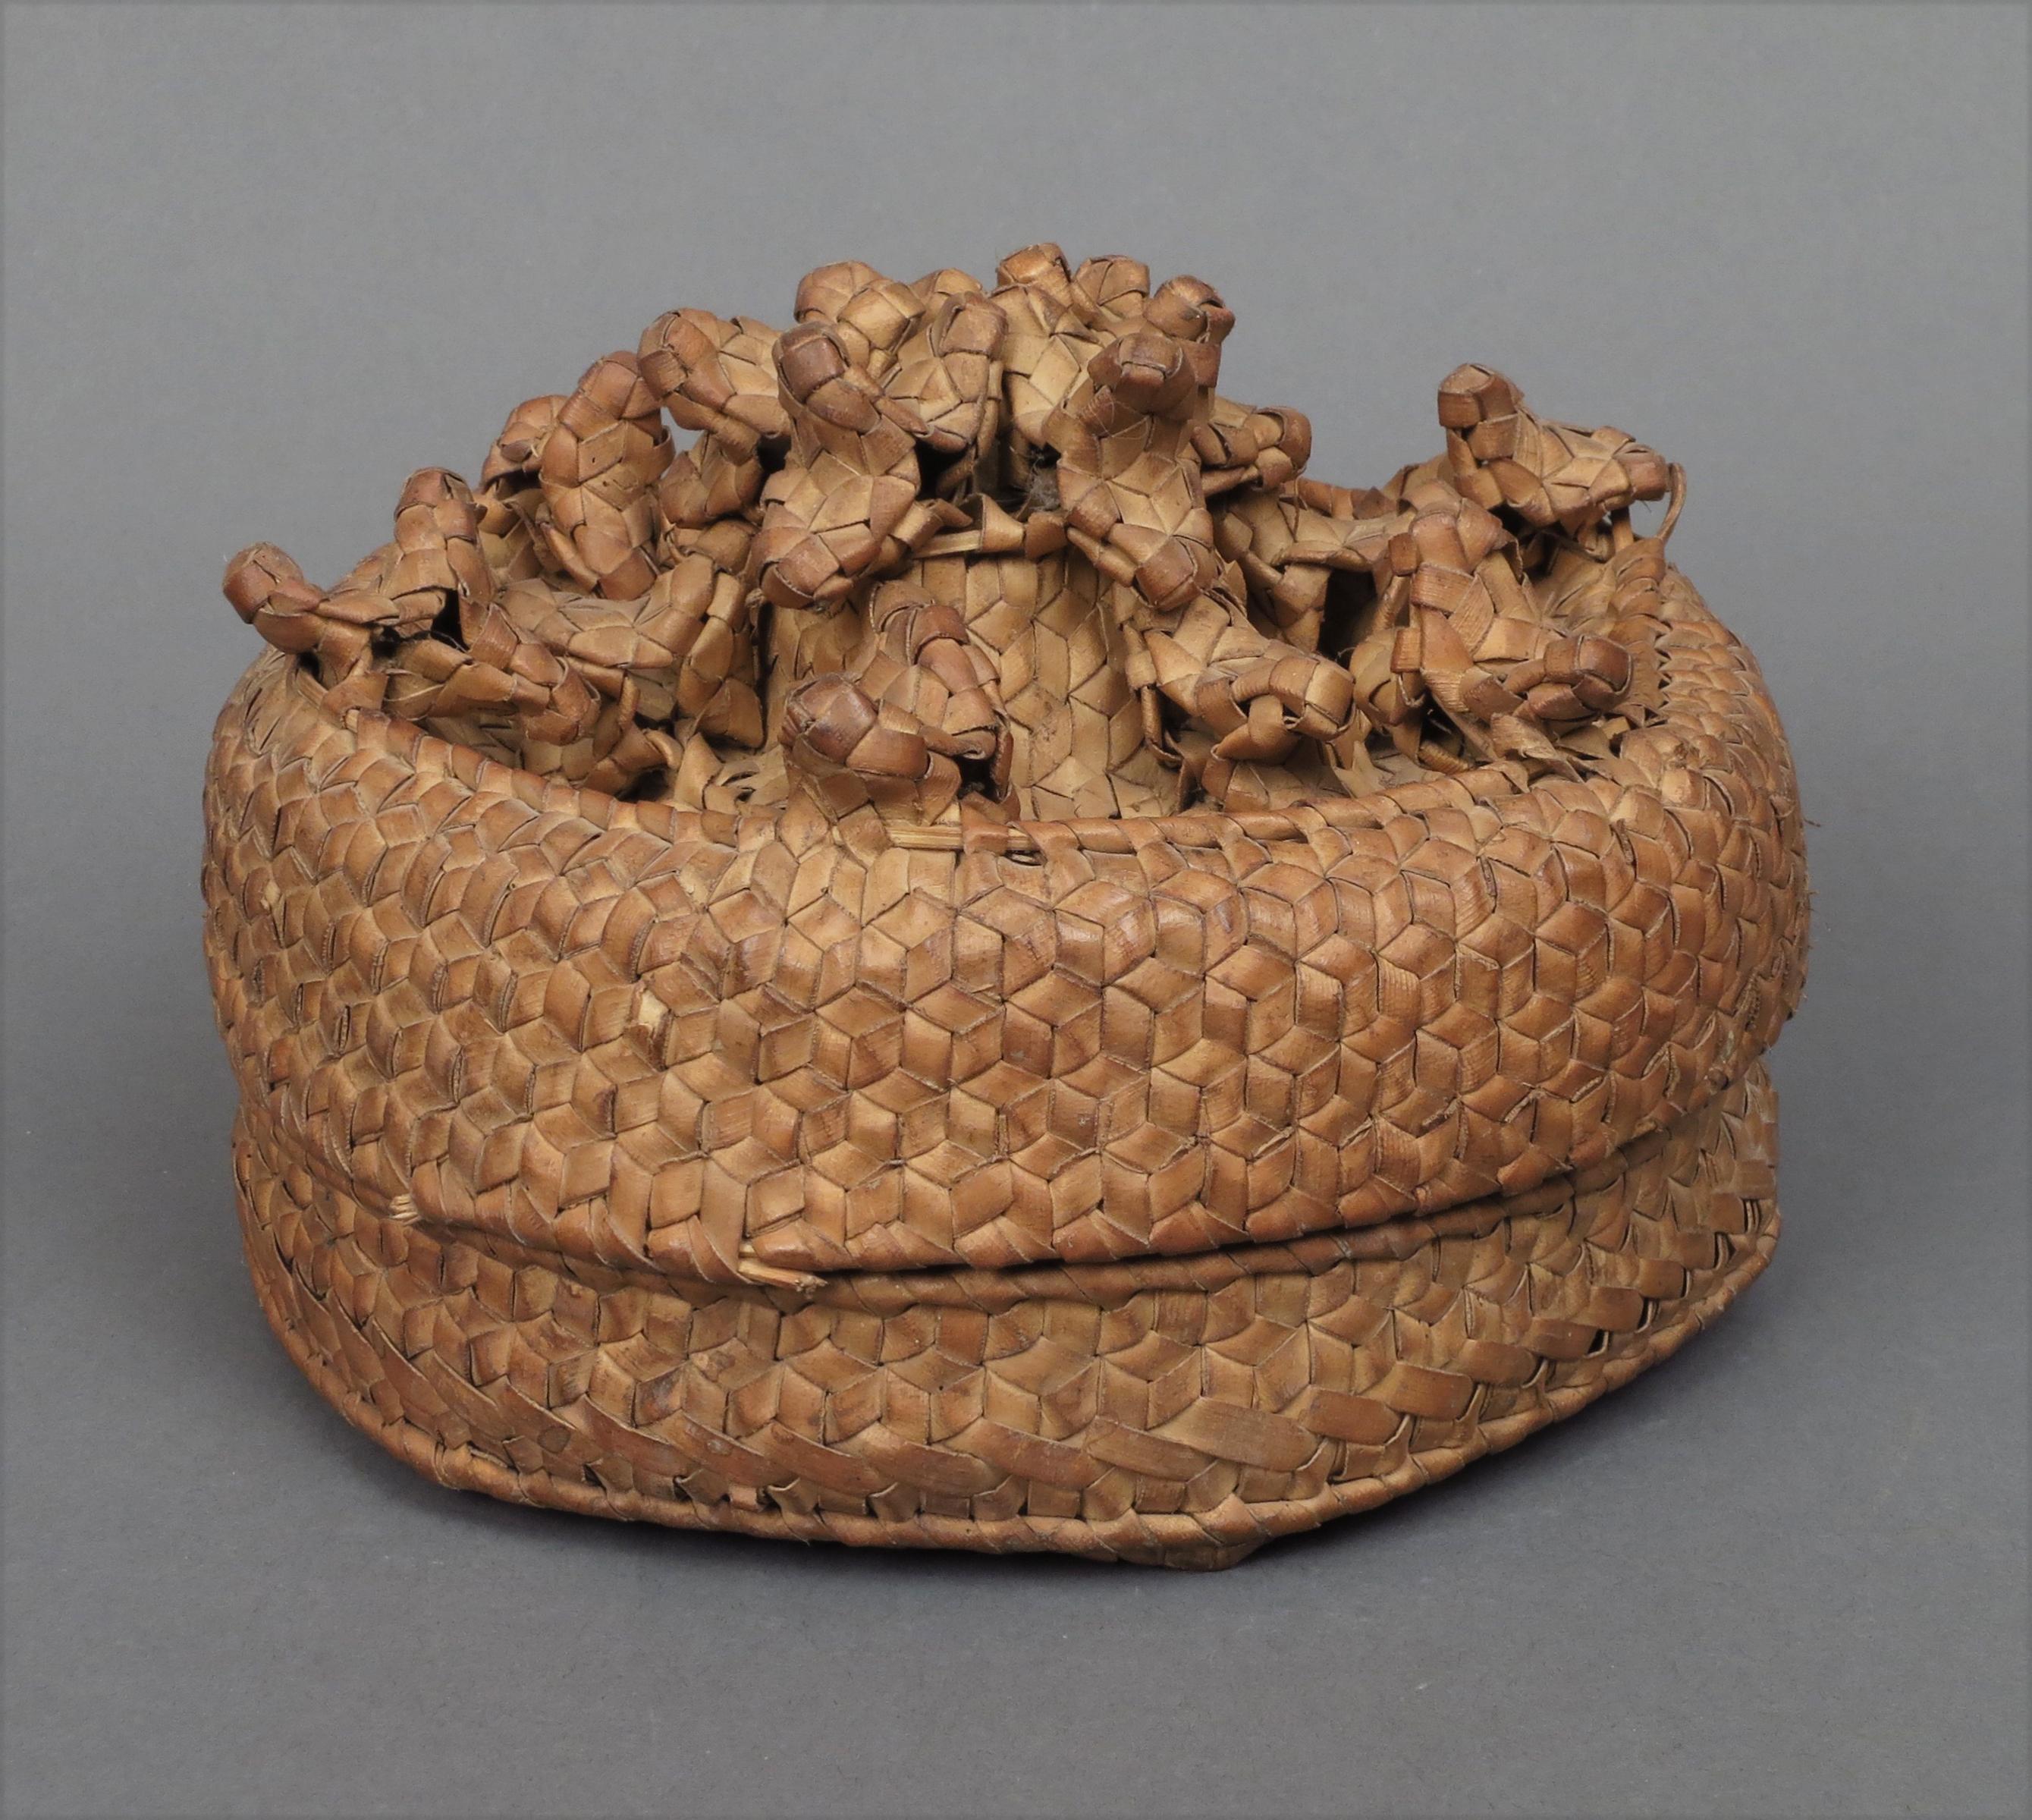 Sumba Chicken Basket2